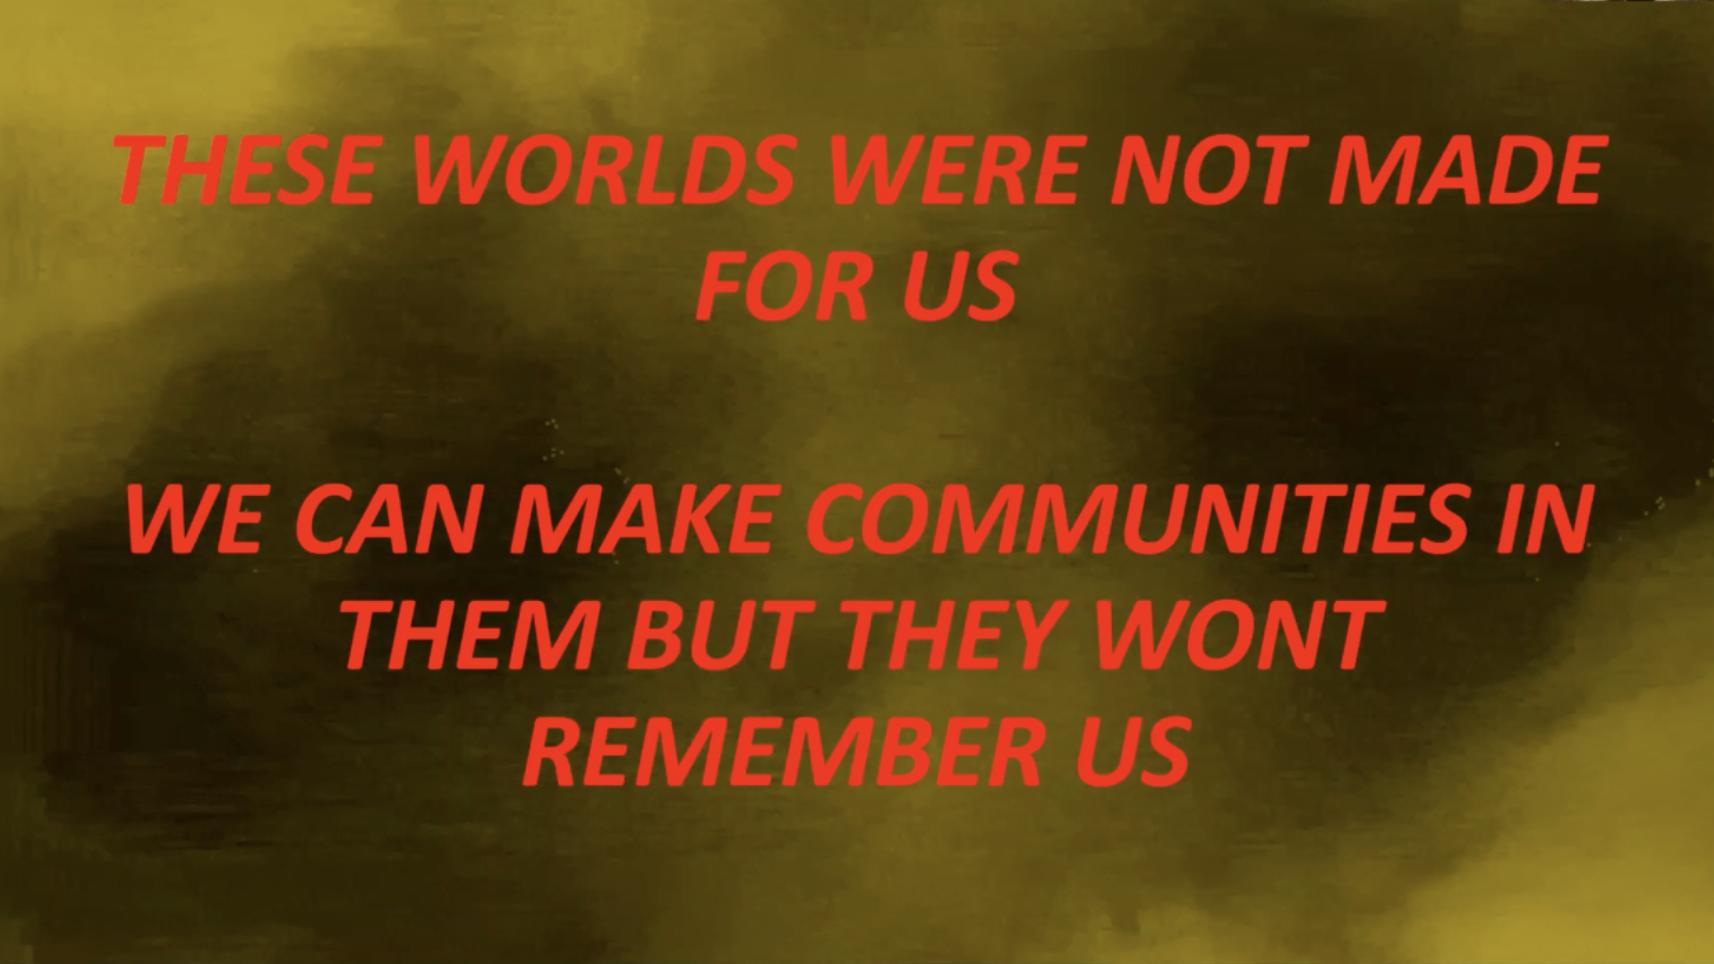 screenshot from a presentation by RESURRECTION LANDS 2020 by Danielle Braithwaite Shirley